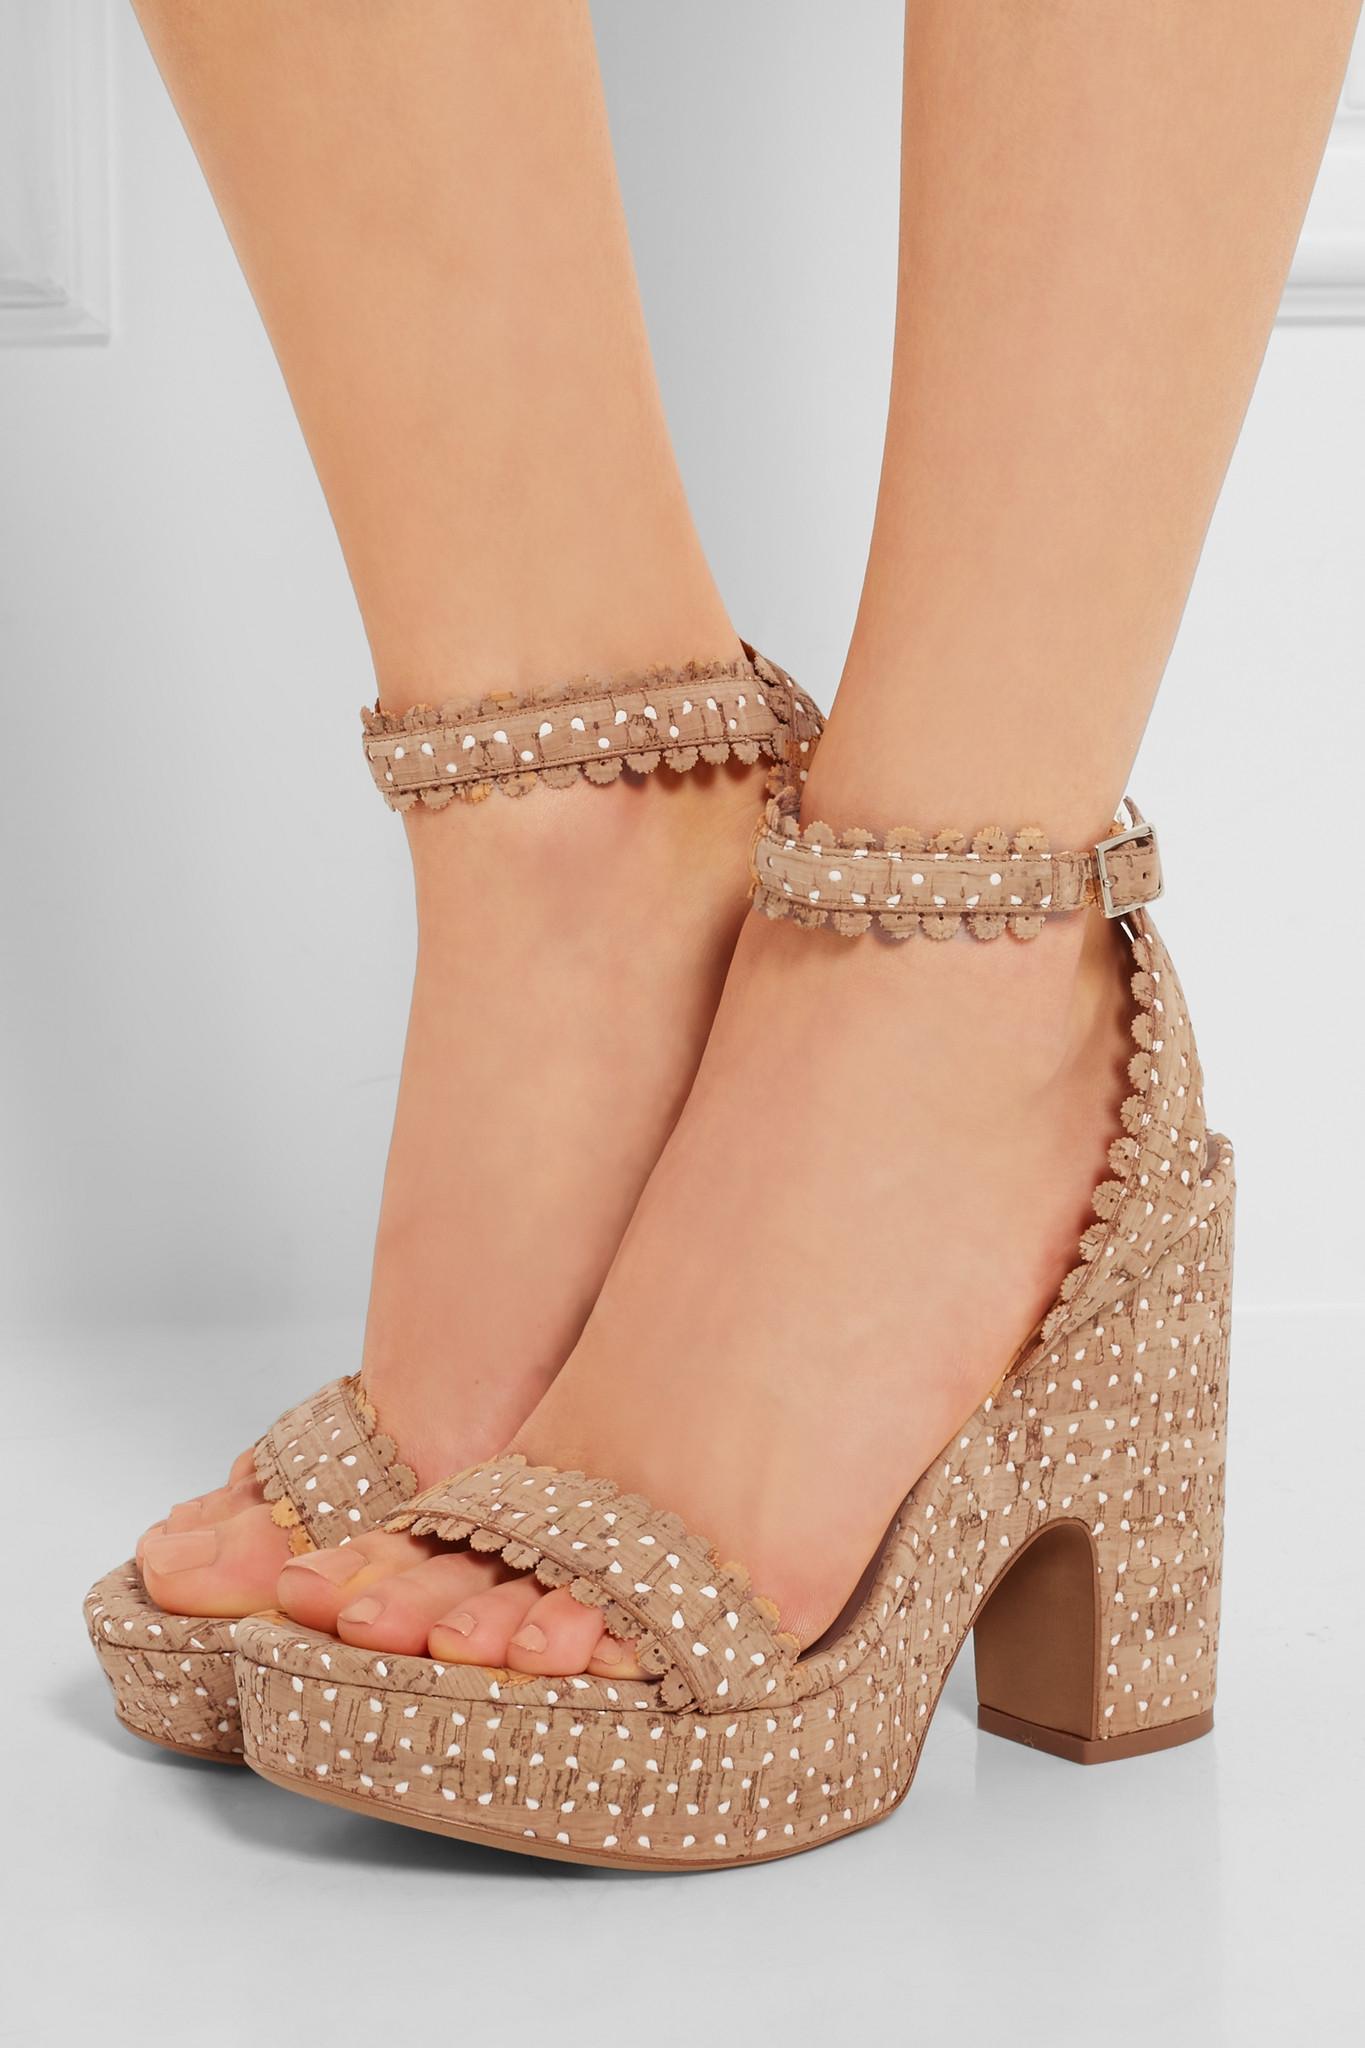 Tabitha Simmons Harlow Platform Sandals discount cheap price g7zK4OT9Q